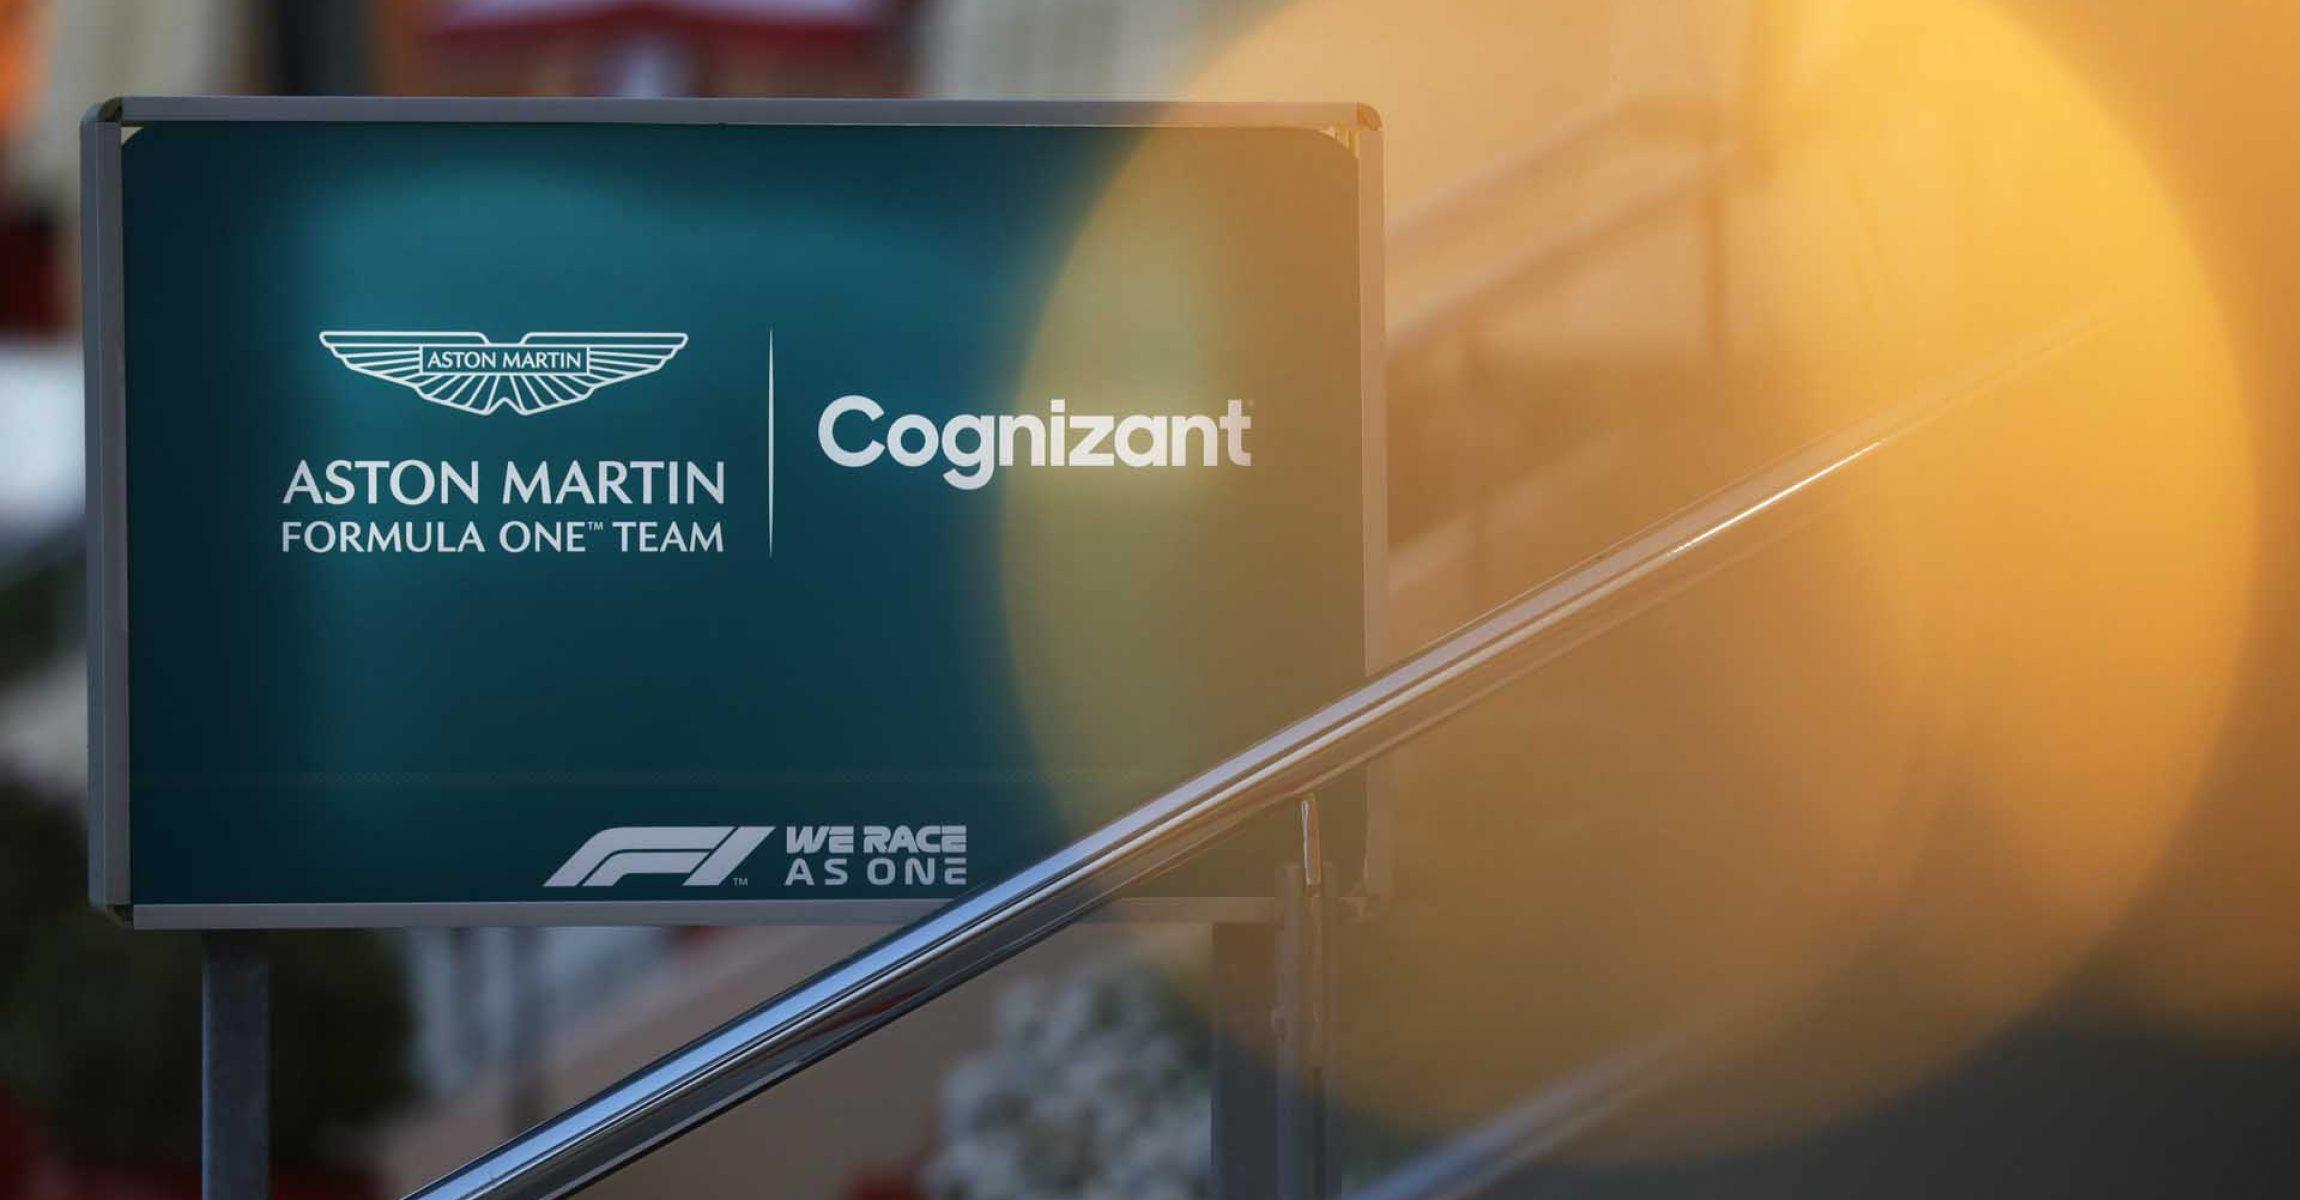 The Aston Martin F1 logo outside the hospitality area